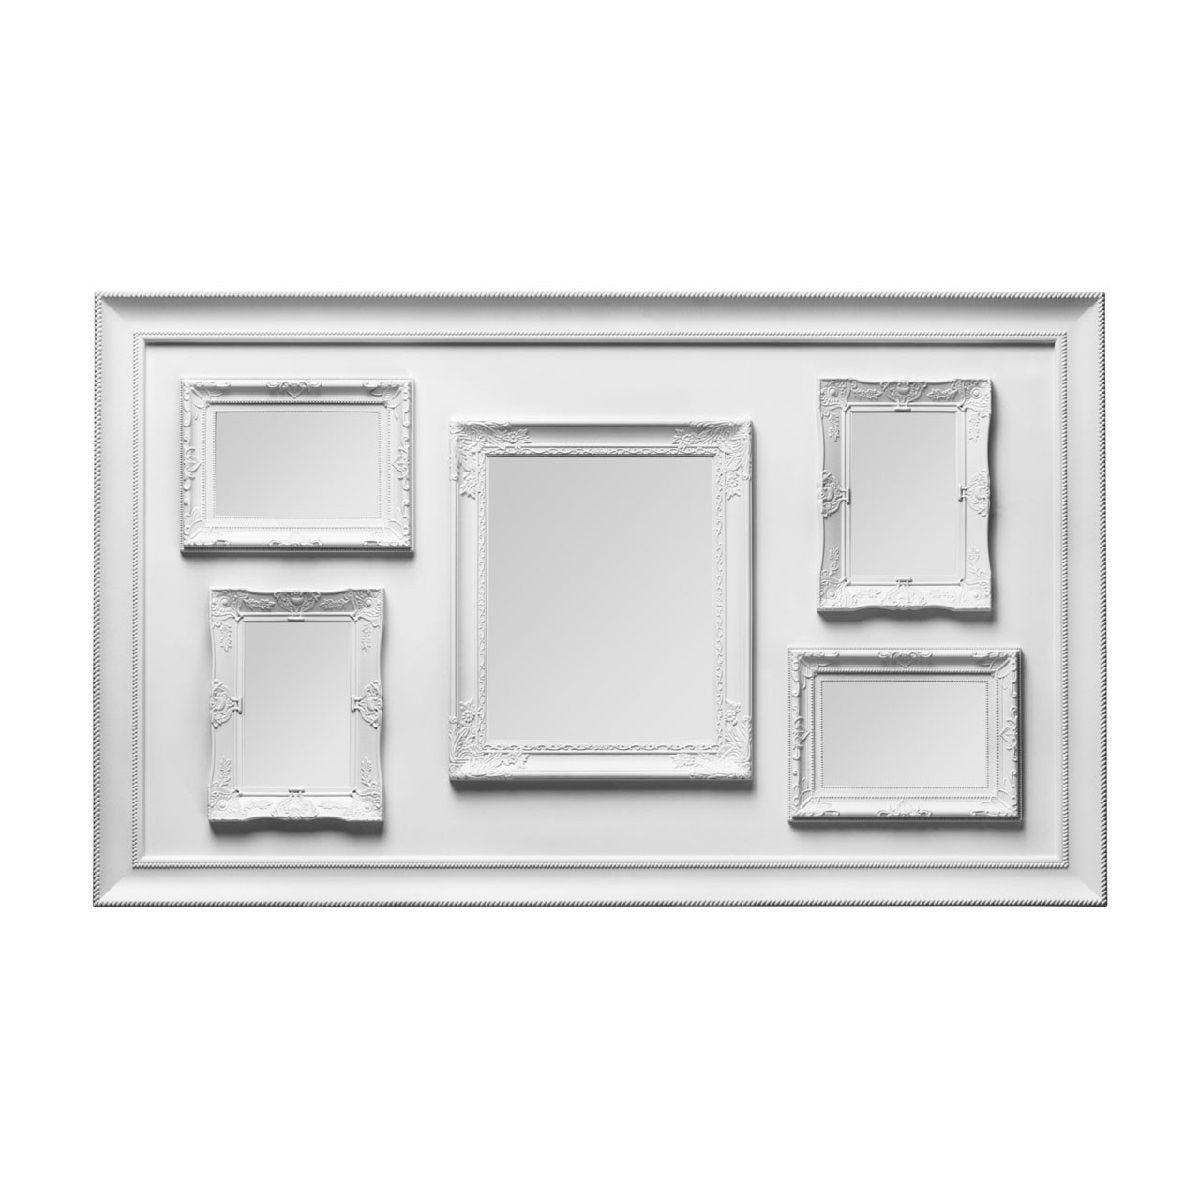 Premier Housewares Multi Photo Frame, 5 Photo White Plastic Frame - 1 Rectangular 8x10, 4 Rectangular 4x6